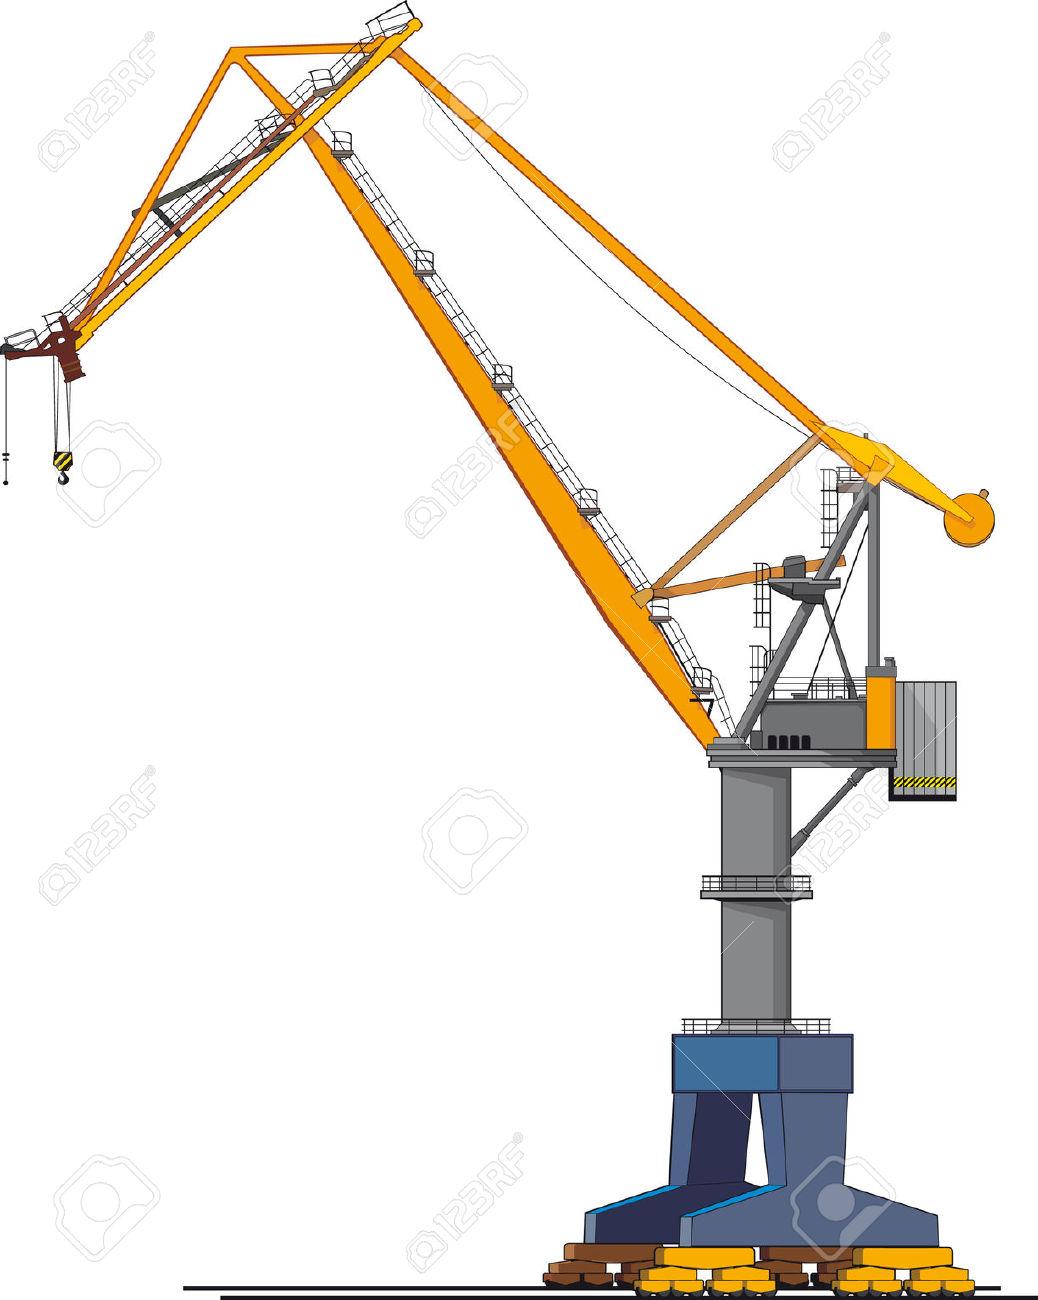 Harbor Freight Gantry Crane >> Harbour cranes clipart 20 free Cliparts | Download images ...